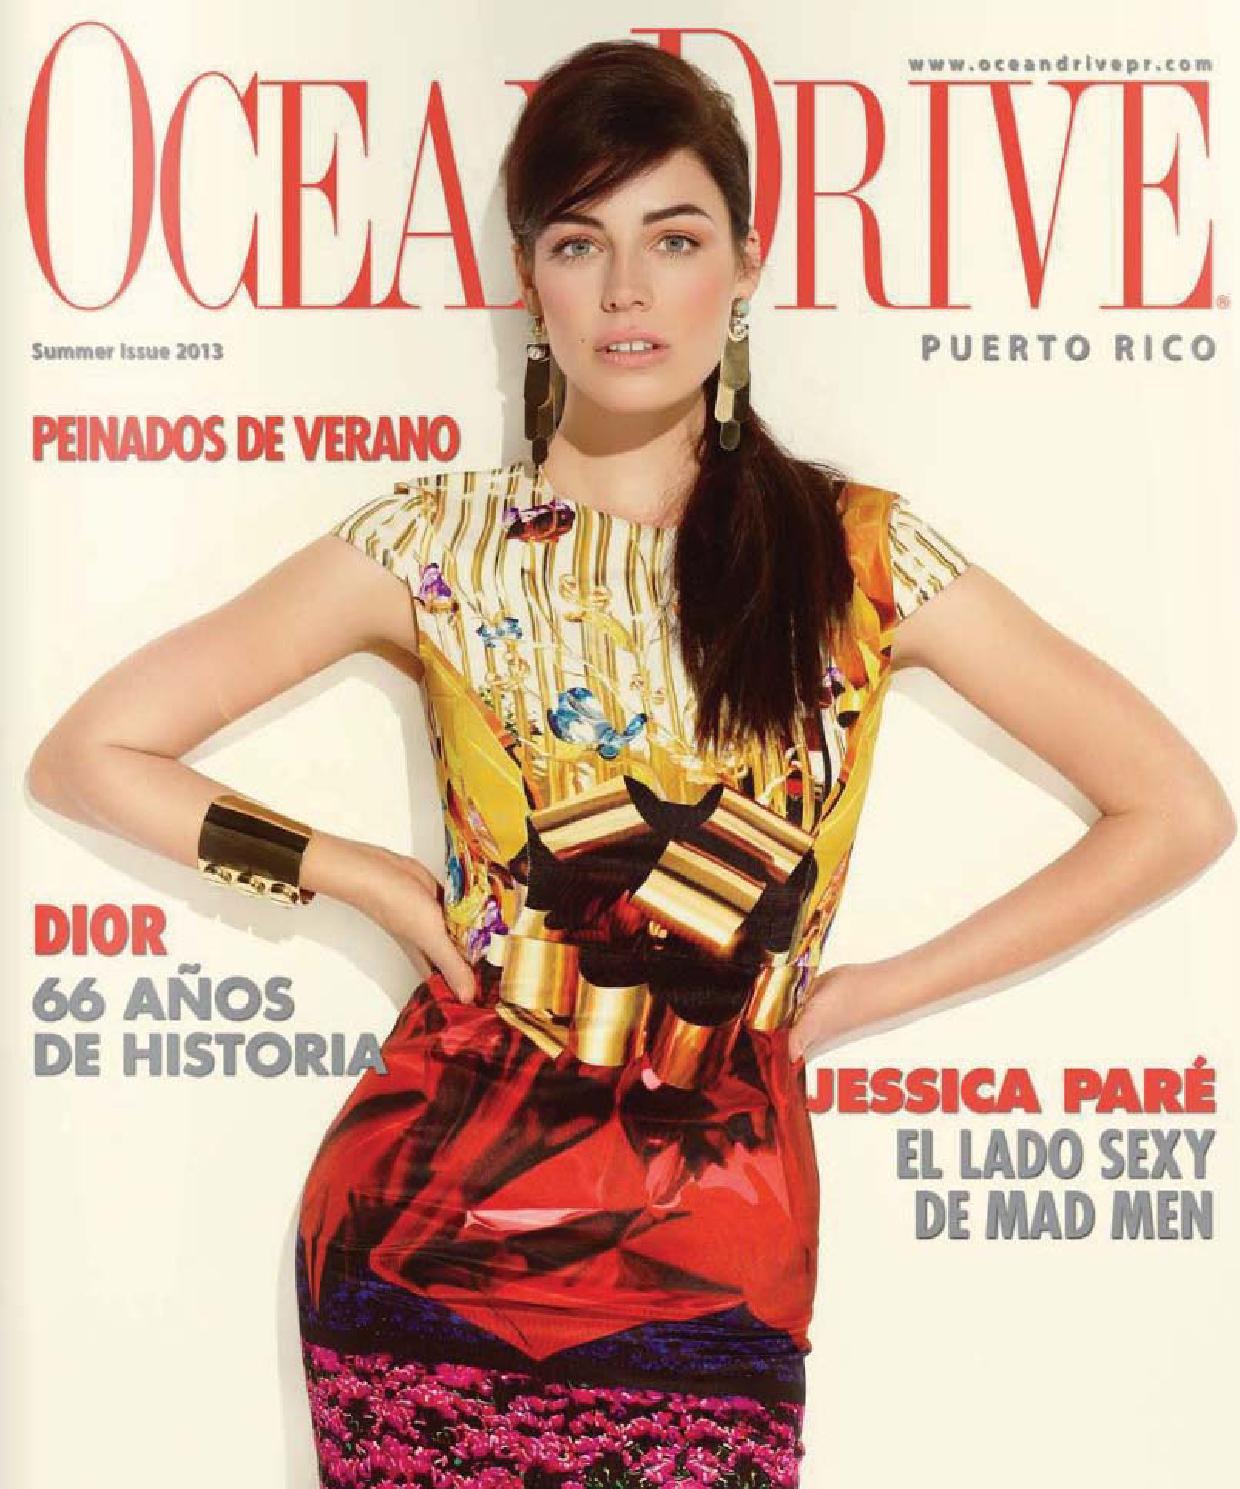 Od Puerto Rico Summer Issue 13 By Carlos Luis Guerra Arabu Issuu Ghirardelli Flats Cecily Brown Cokelat Muda 37